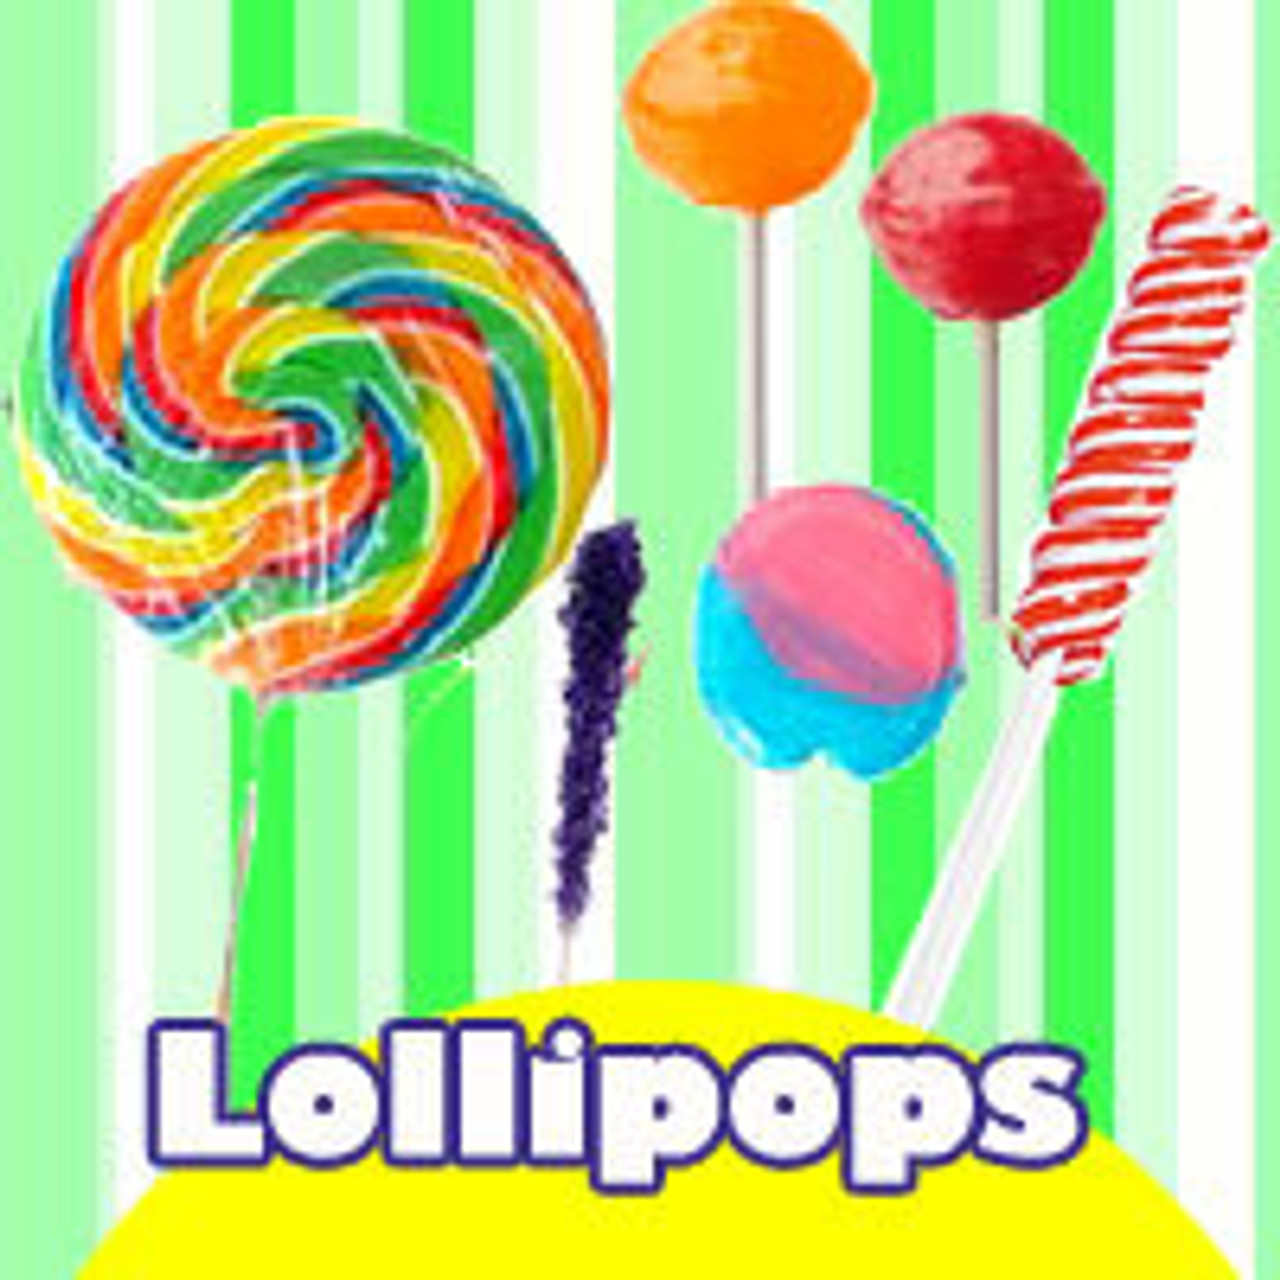 Candy Buffet Lollipops